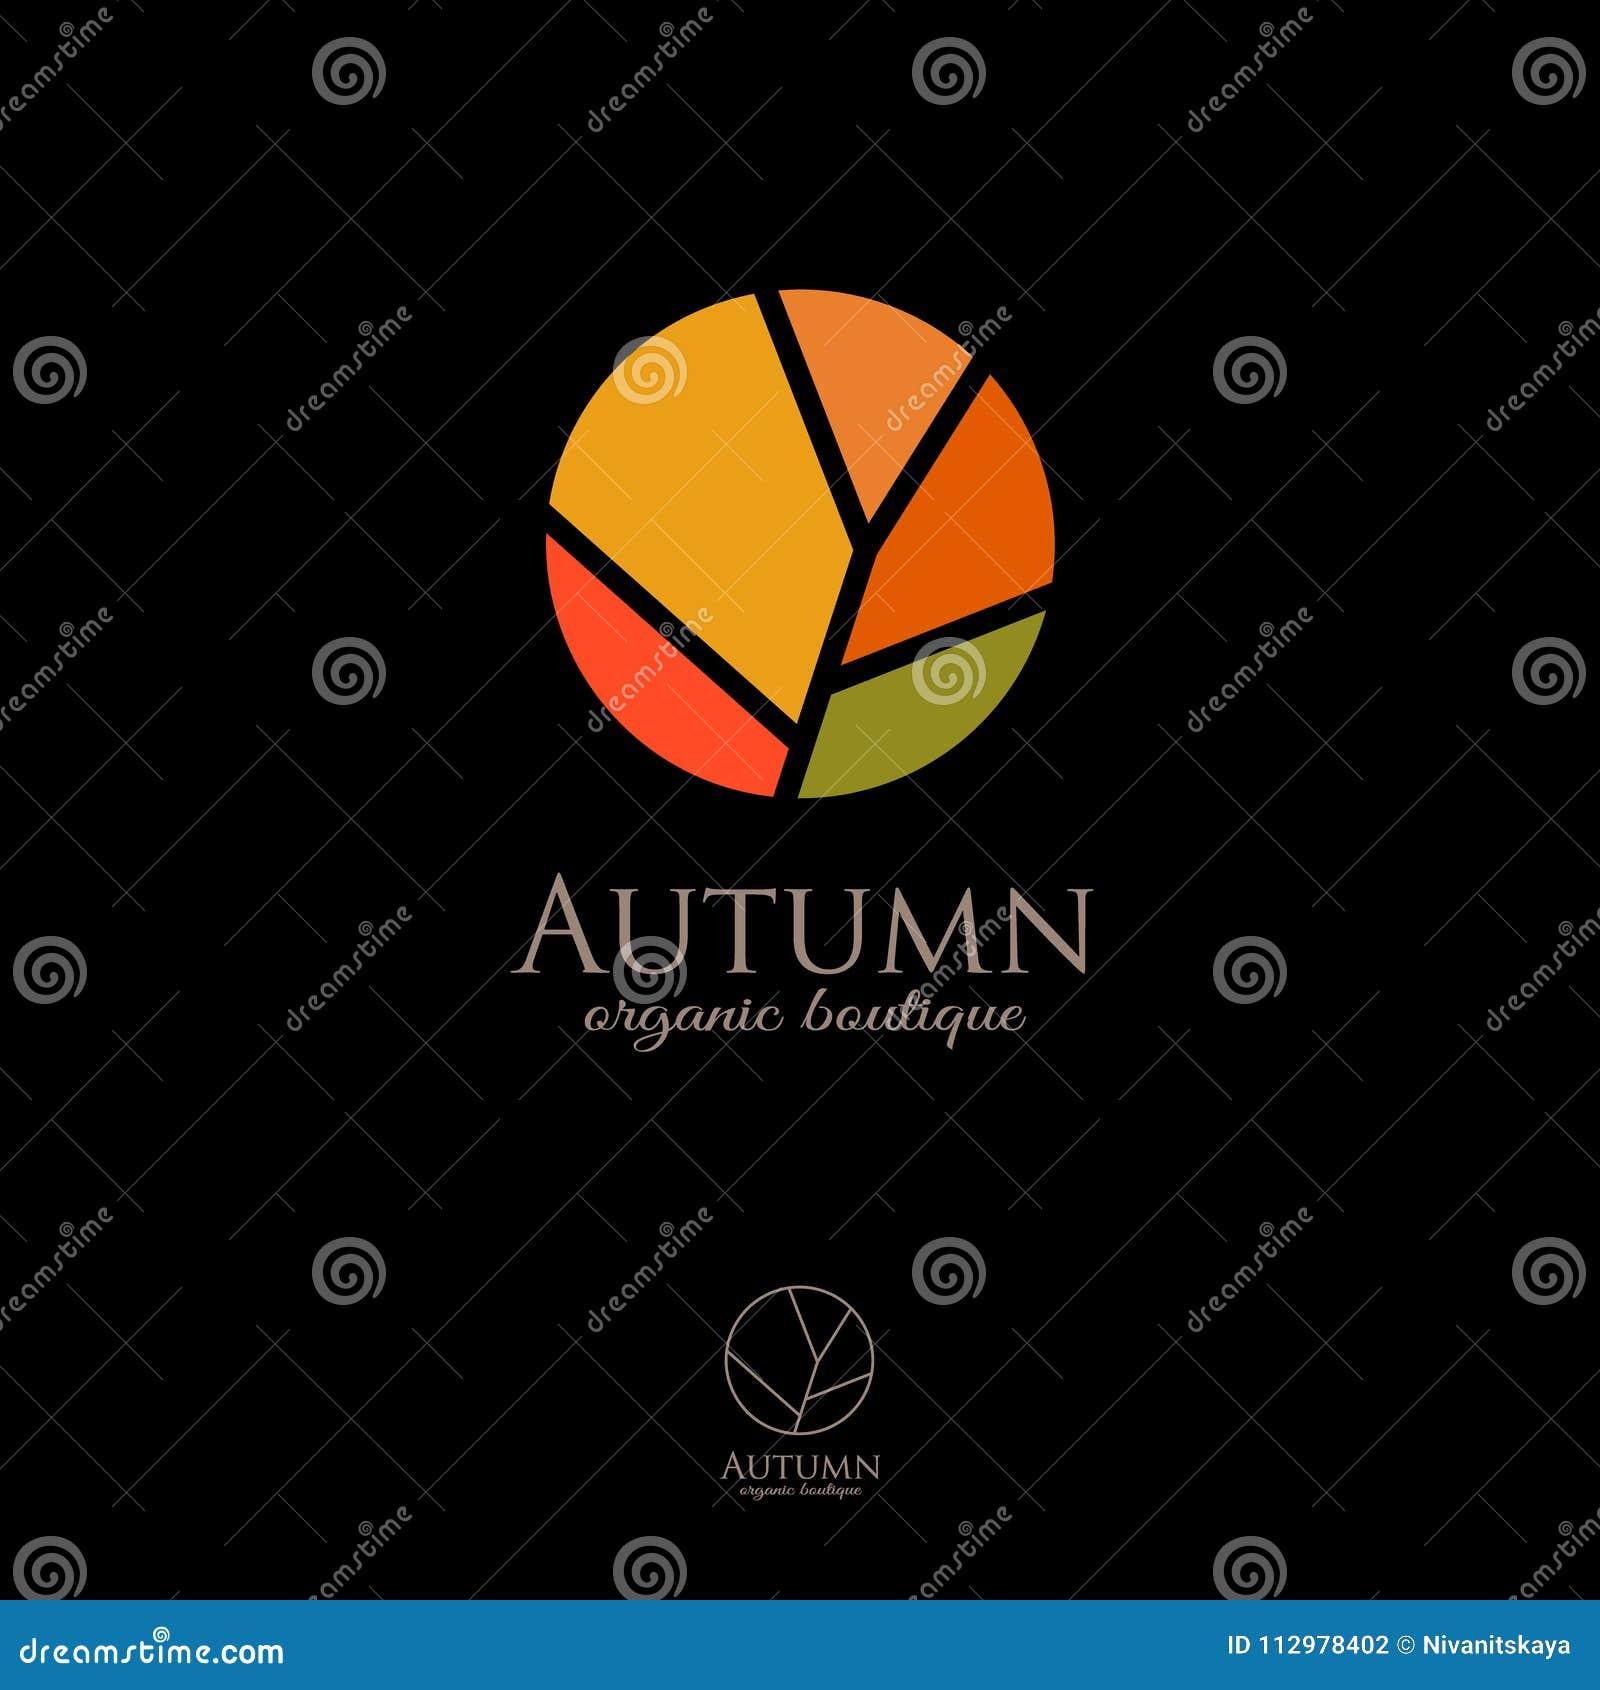 Fall logo. Autumn logo. Organic Shop emblem. Autumn symbol on a dark background.